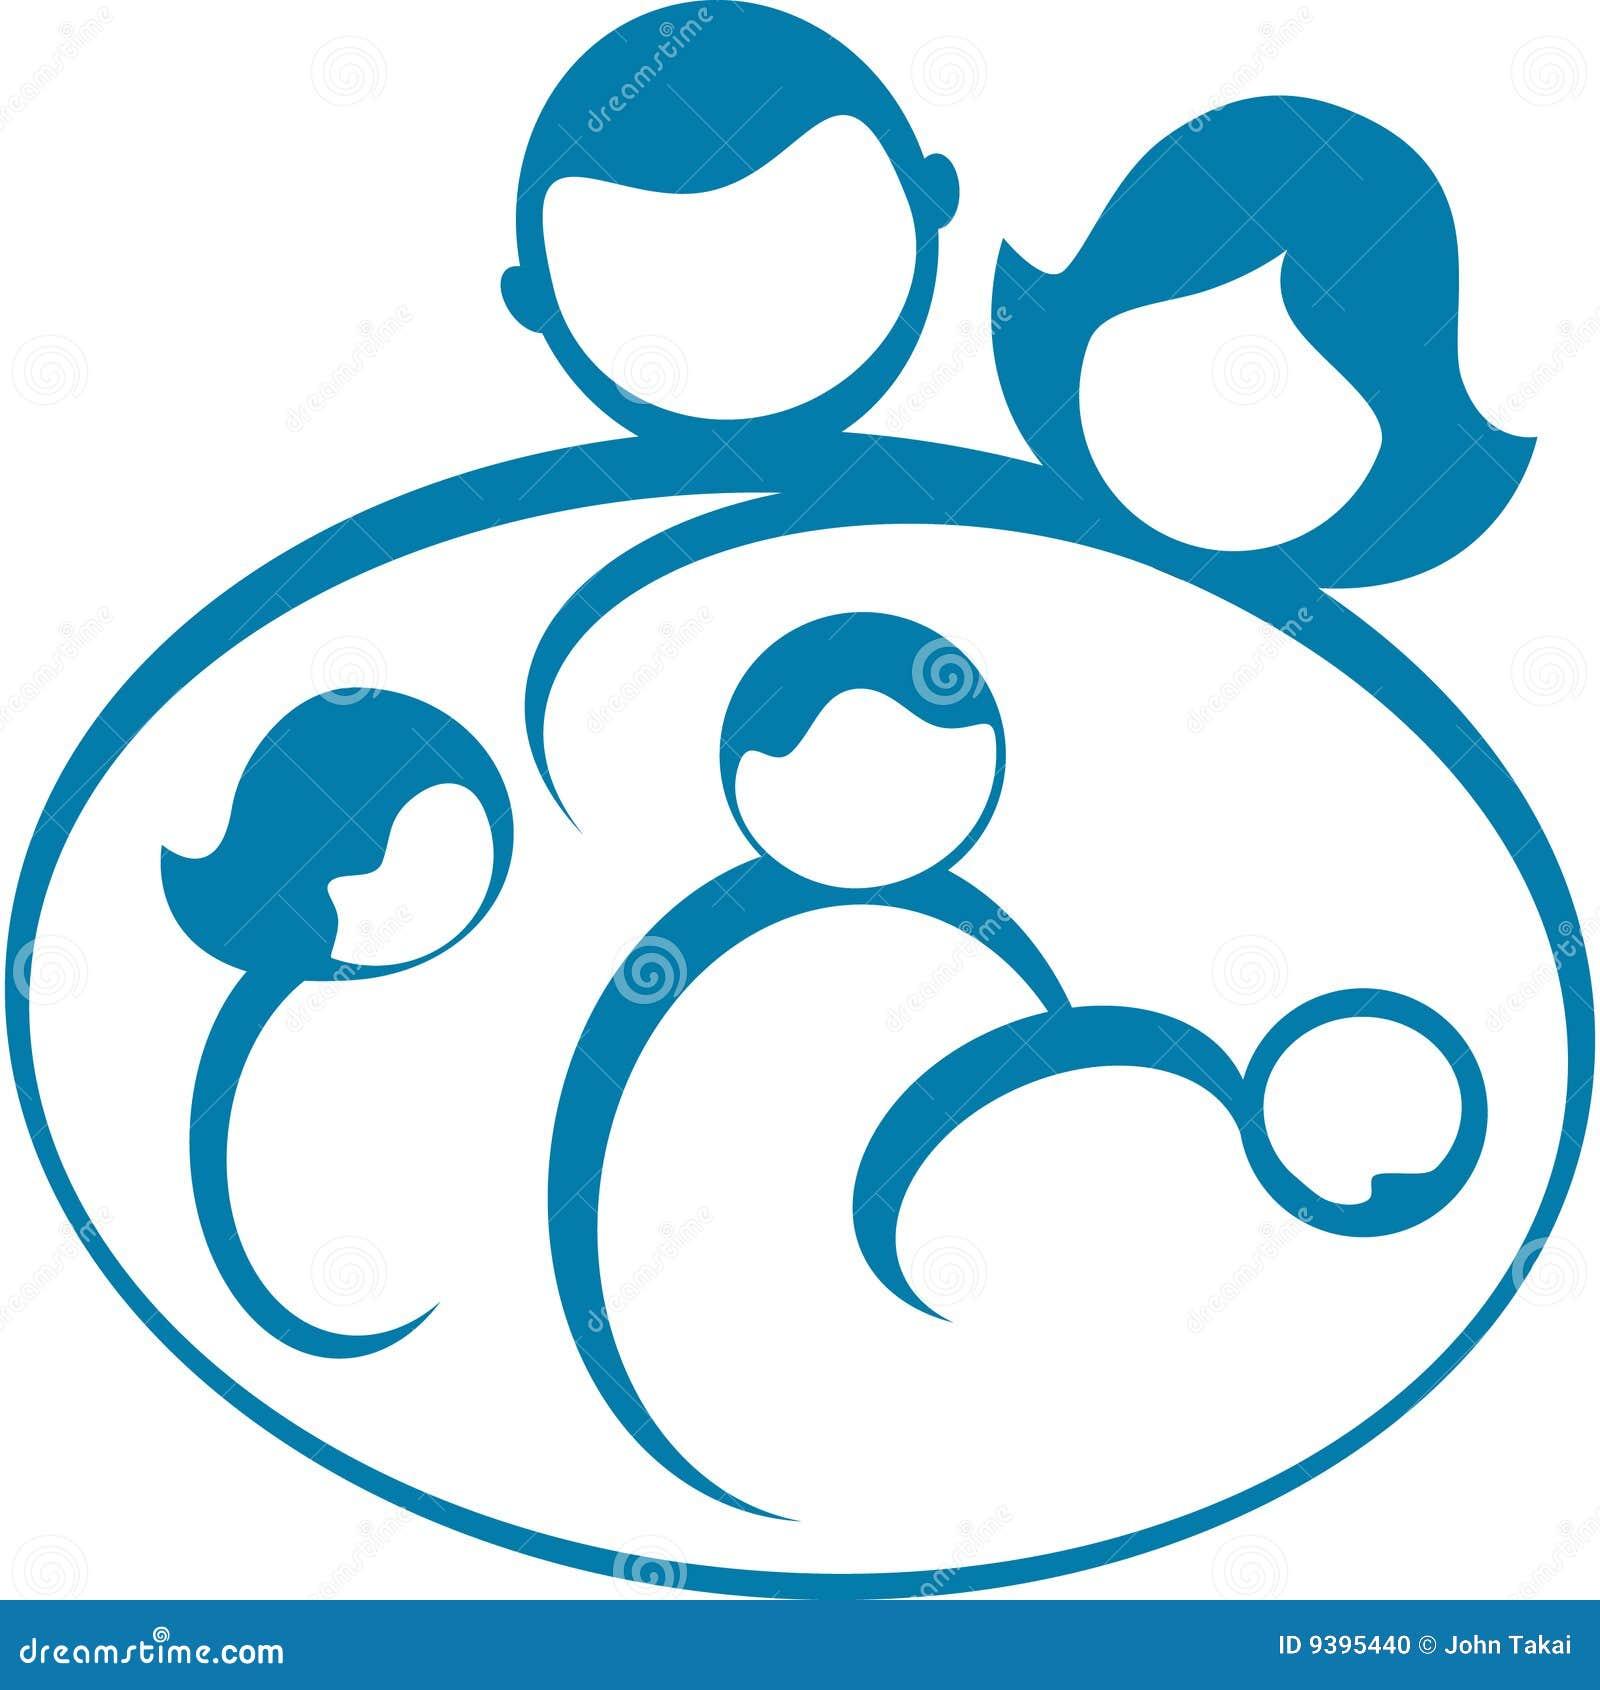 Family Logo Stock Vector Illustration Of Family Symbol 9395440